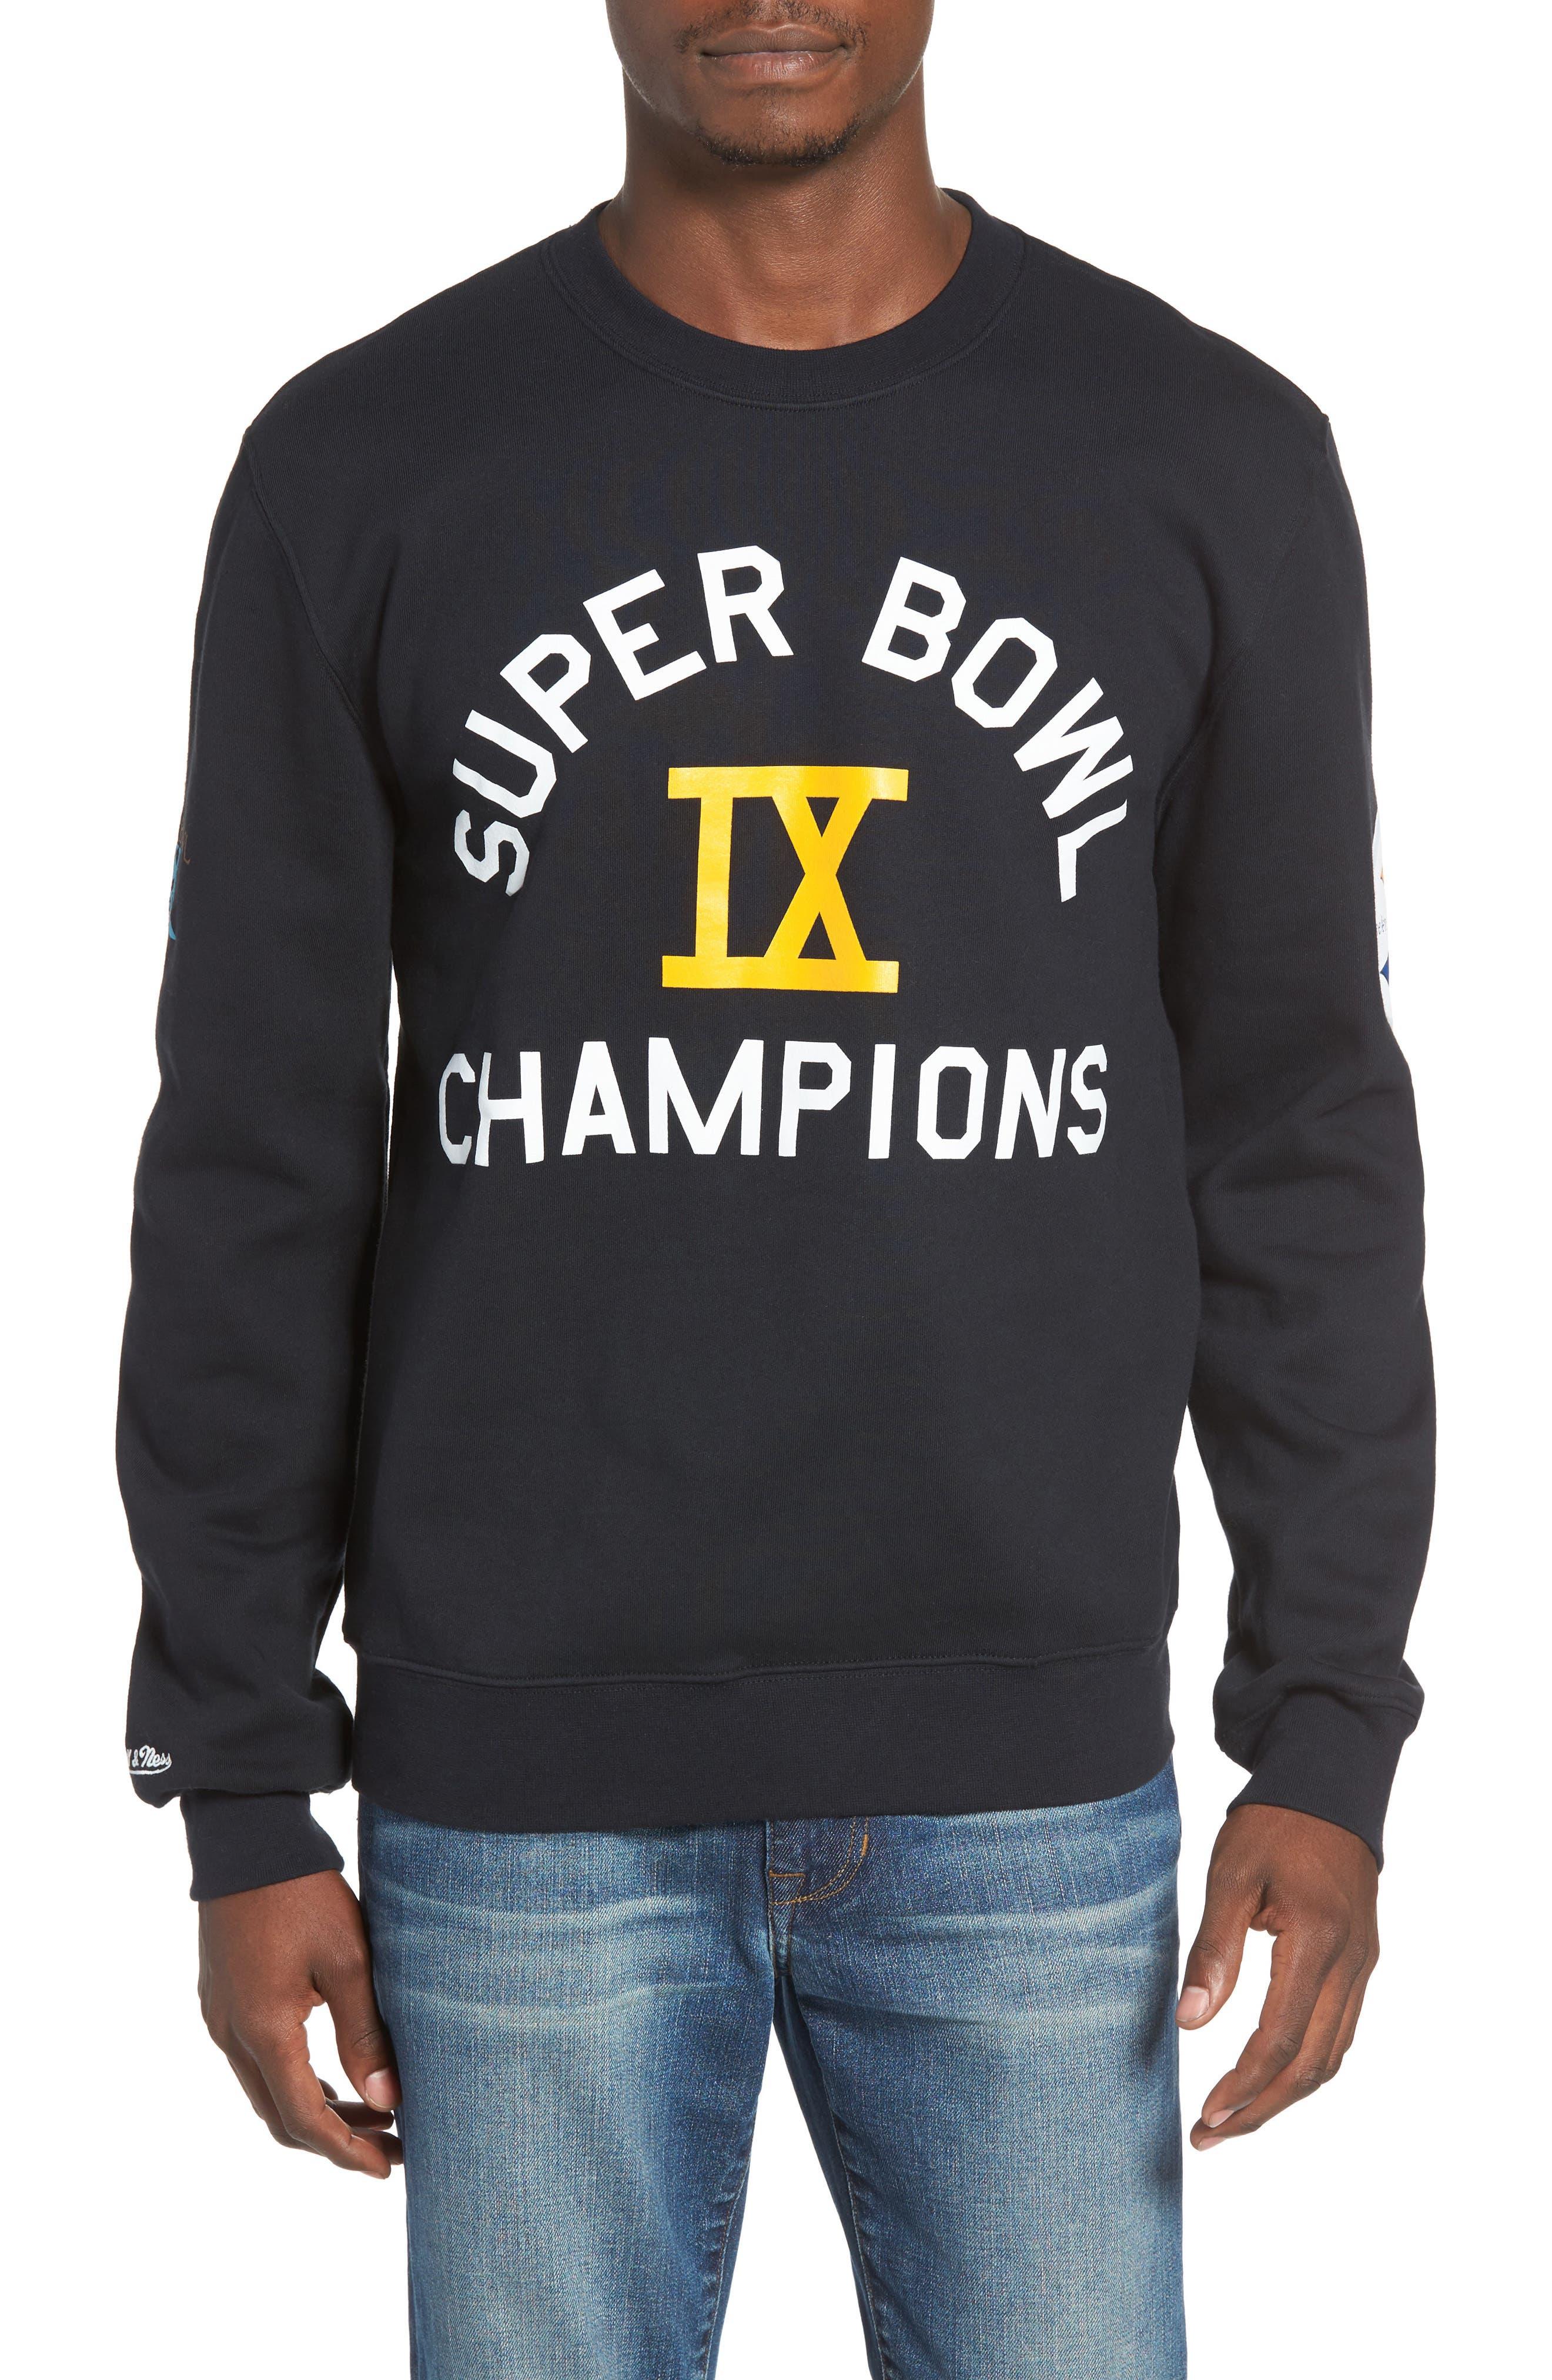 NFL Championship - Pittsburgh Steelers Sweatshirt, Main, color, 001